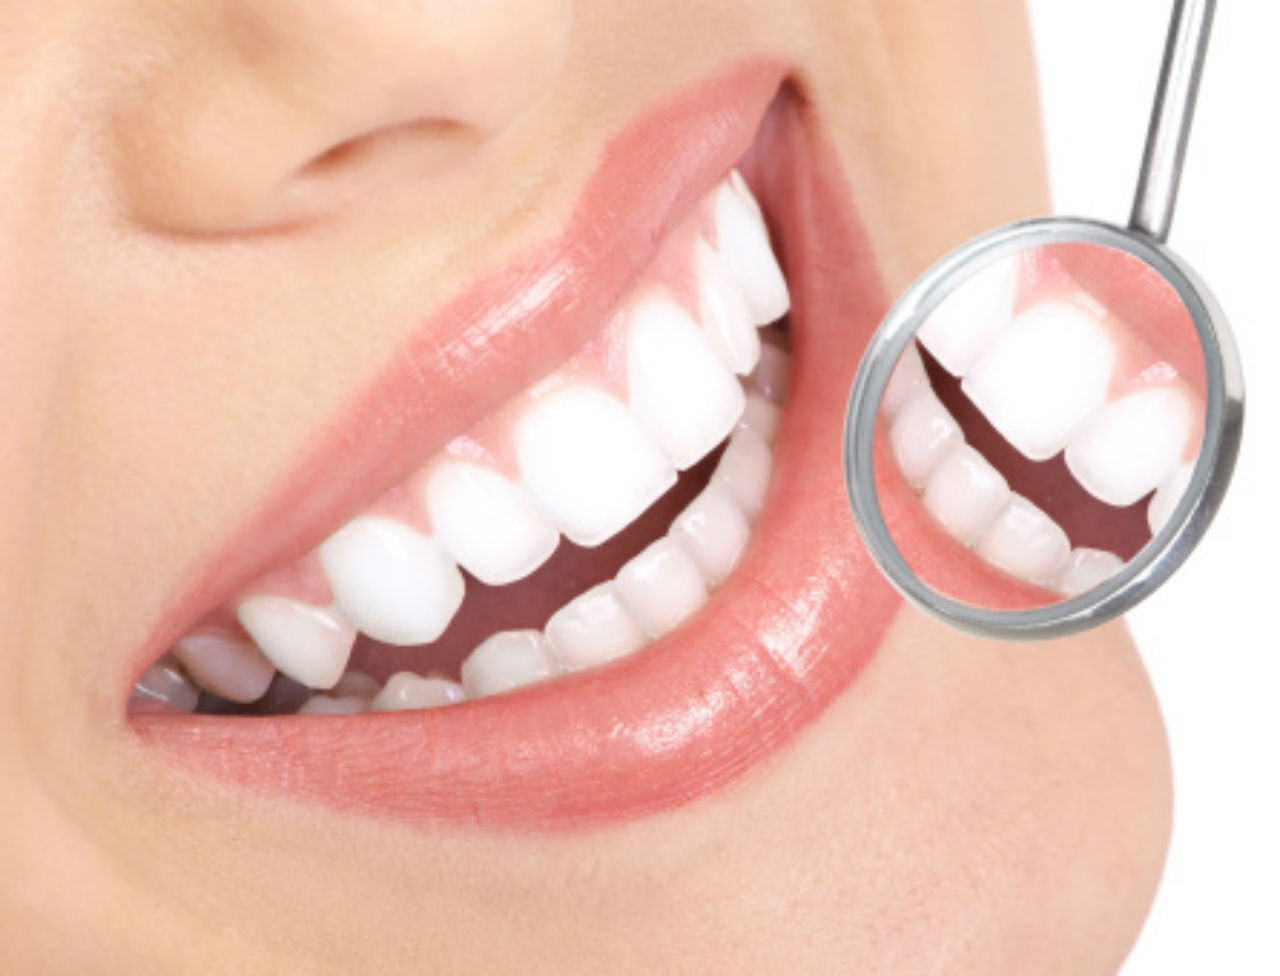 Où est installé votre dentiste?